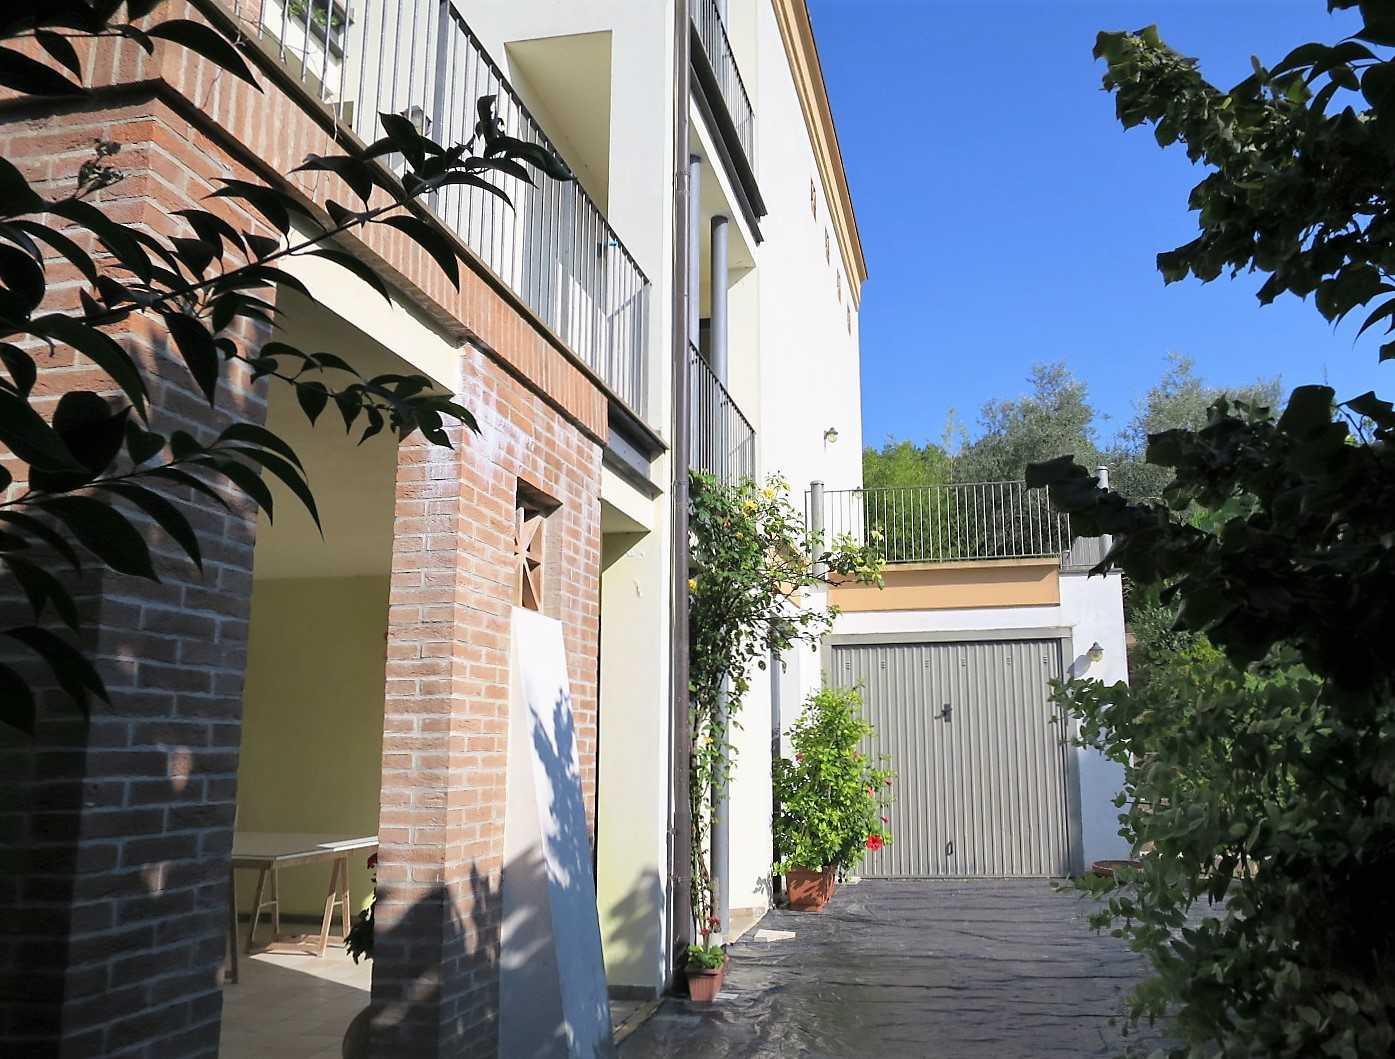 Villa Villa in vendita Atri (TE), Villa Paola - Atri - EUR 471.071 160